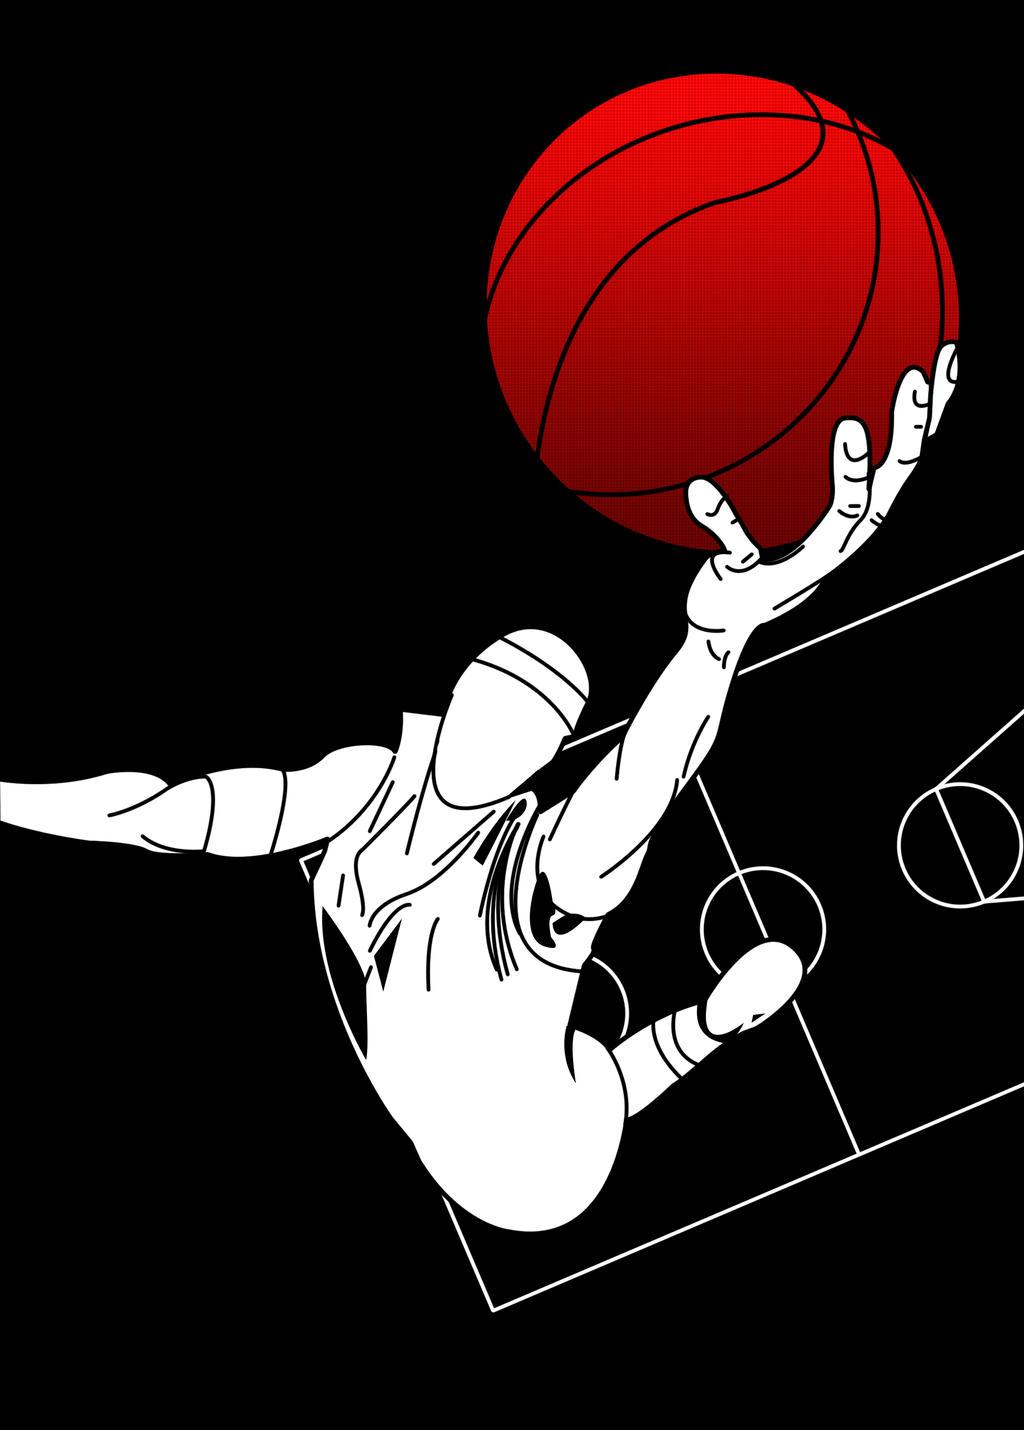 Basketball by Valadj